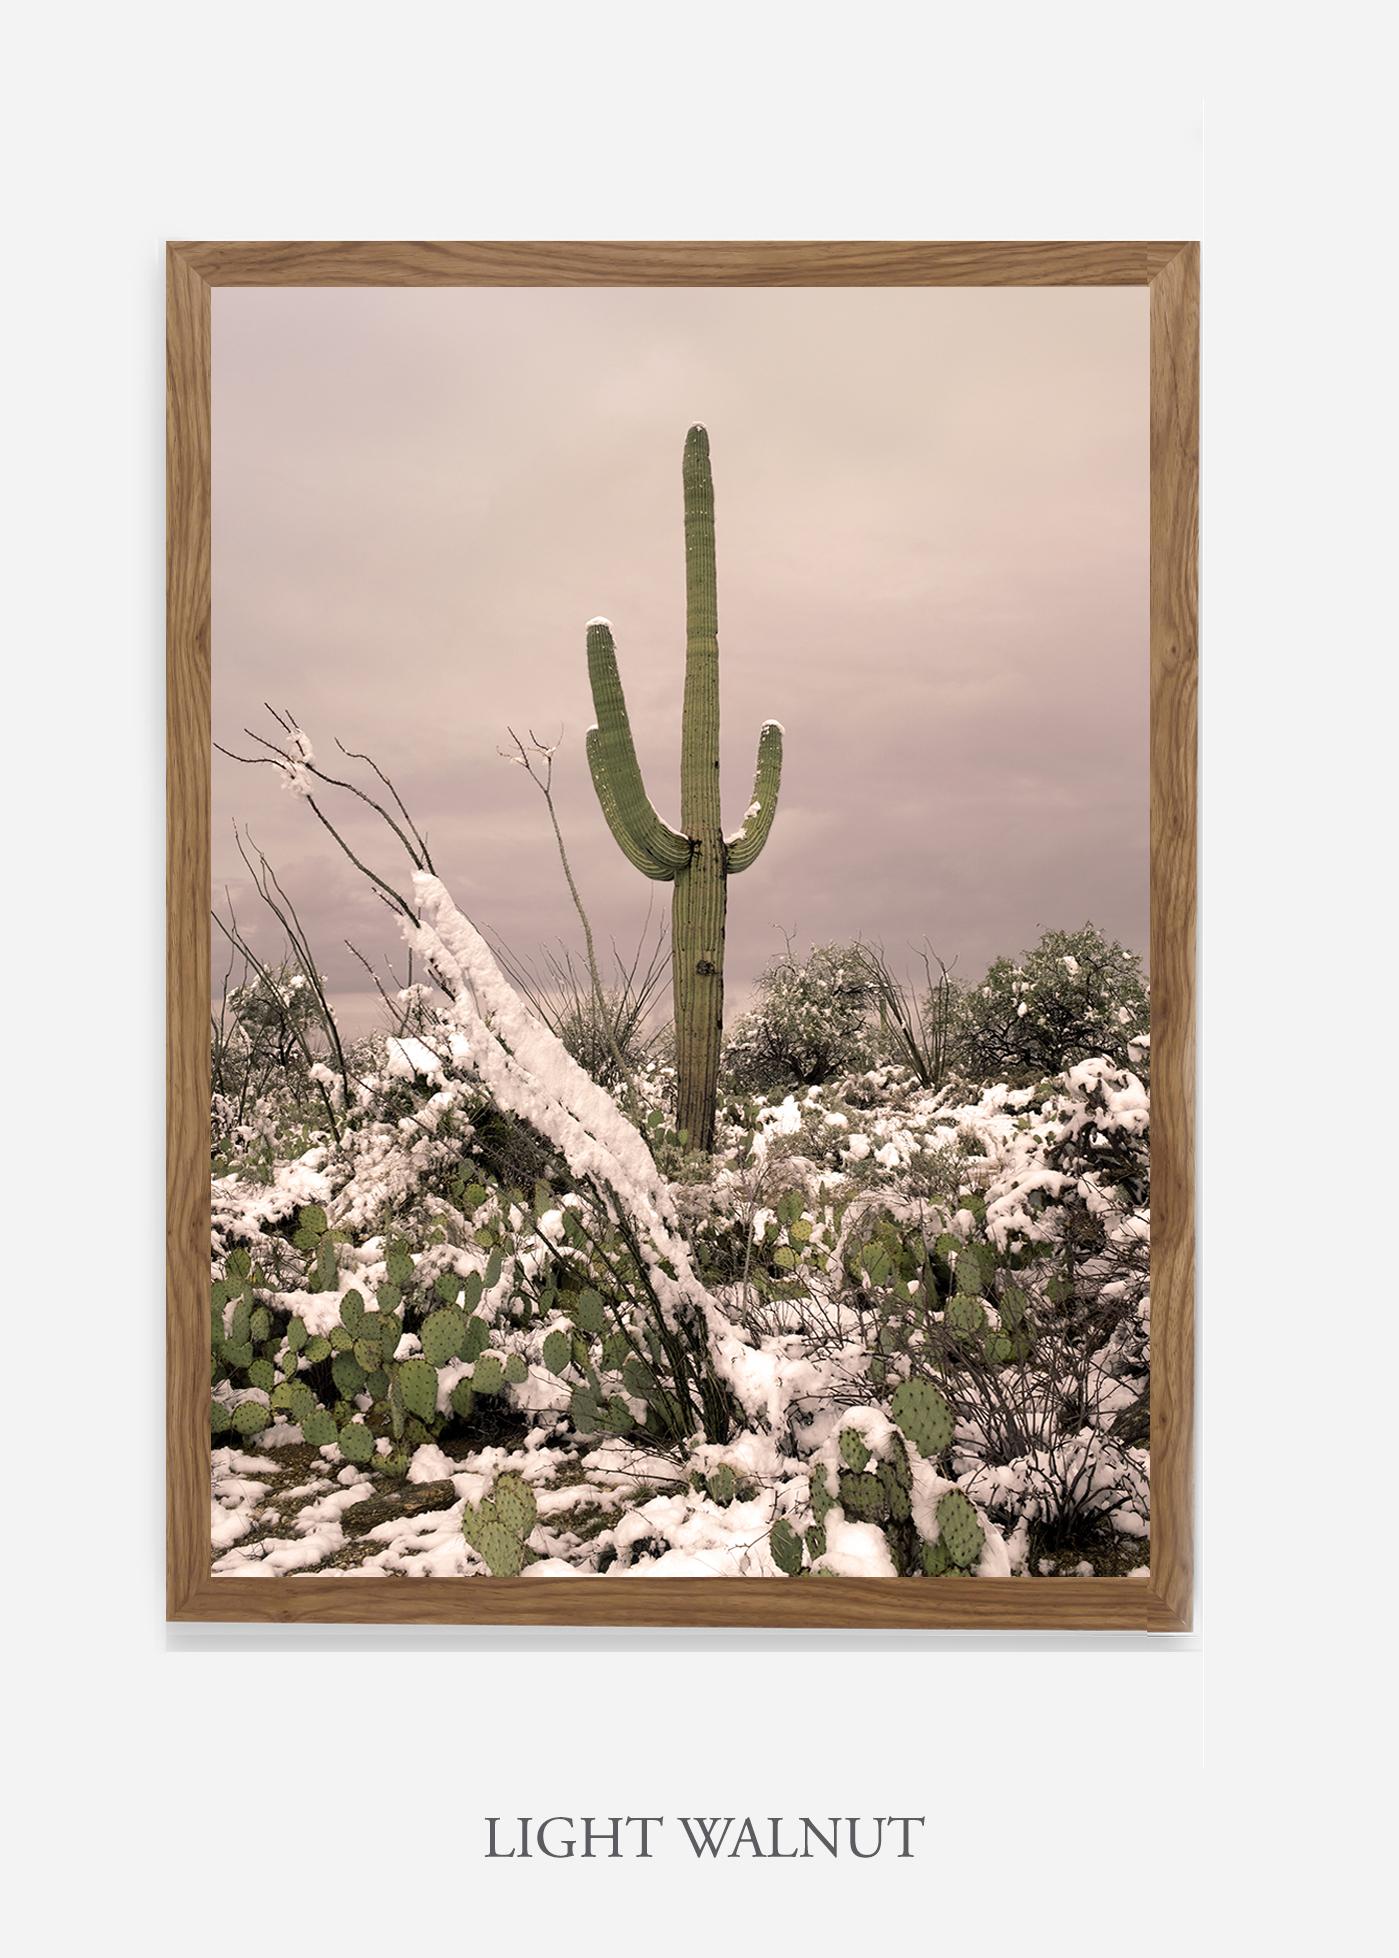 nomat-lightwalnutframe-saguaroNo.4-wildercalifornia-art-wallart-cactusprint-homedecor-prints-arizona-botanical-artwork-interiordesign.jpg